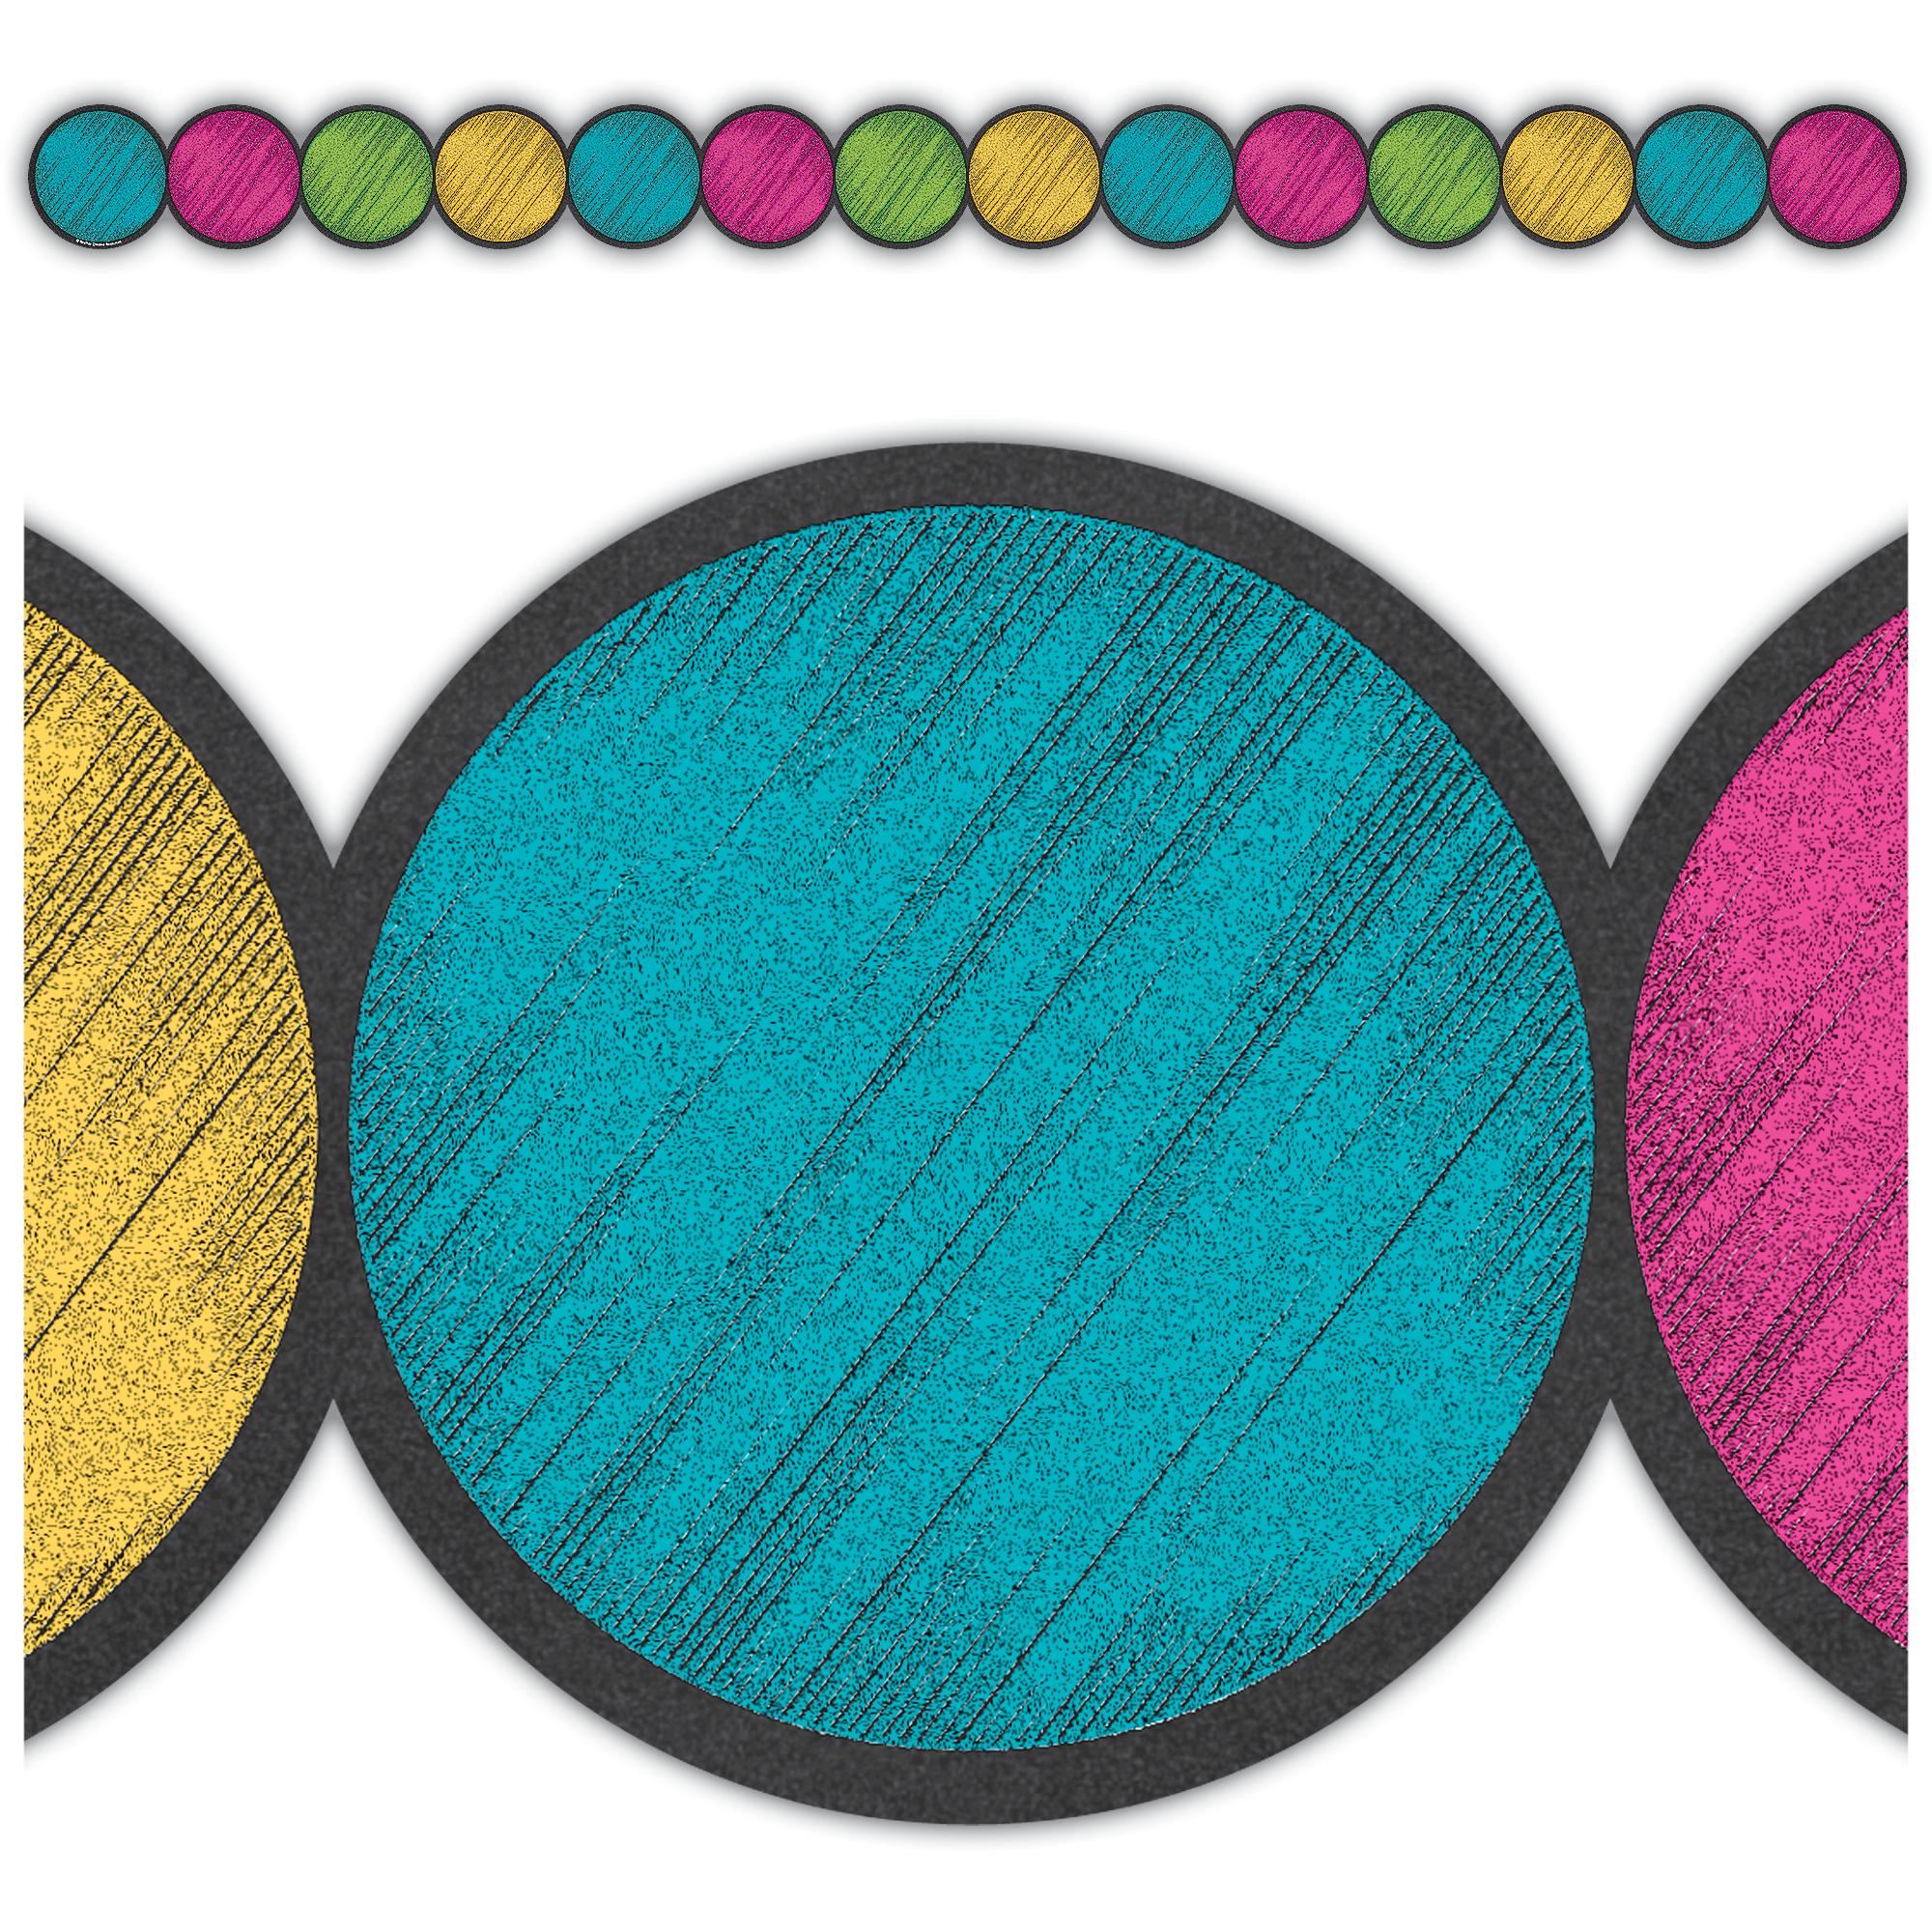 Chalkboard Stickers For Wall Chalkboard Brights Circles Die Cut Border Trim Tcr3498